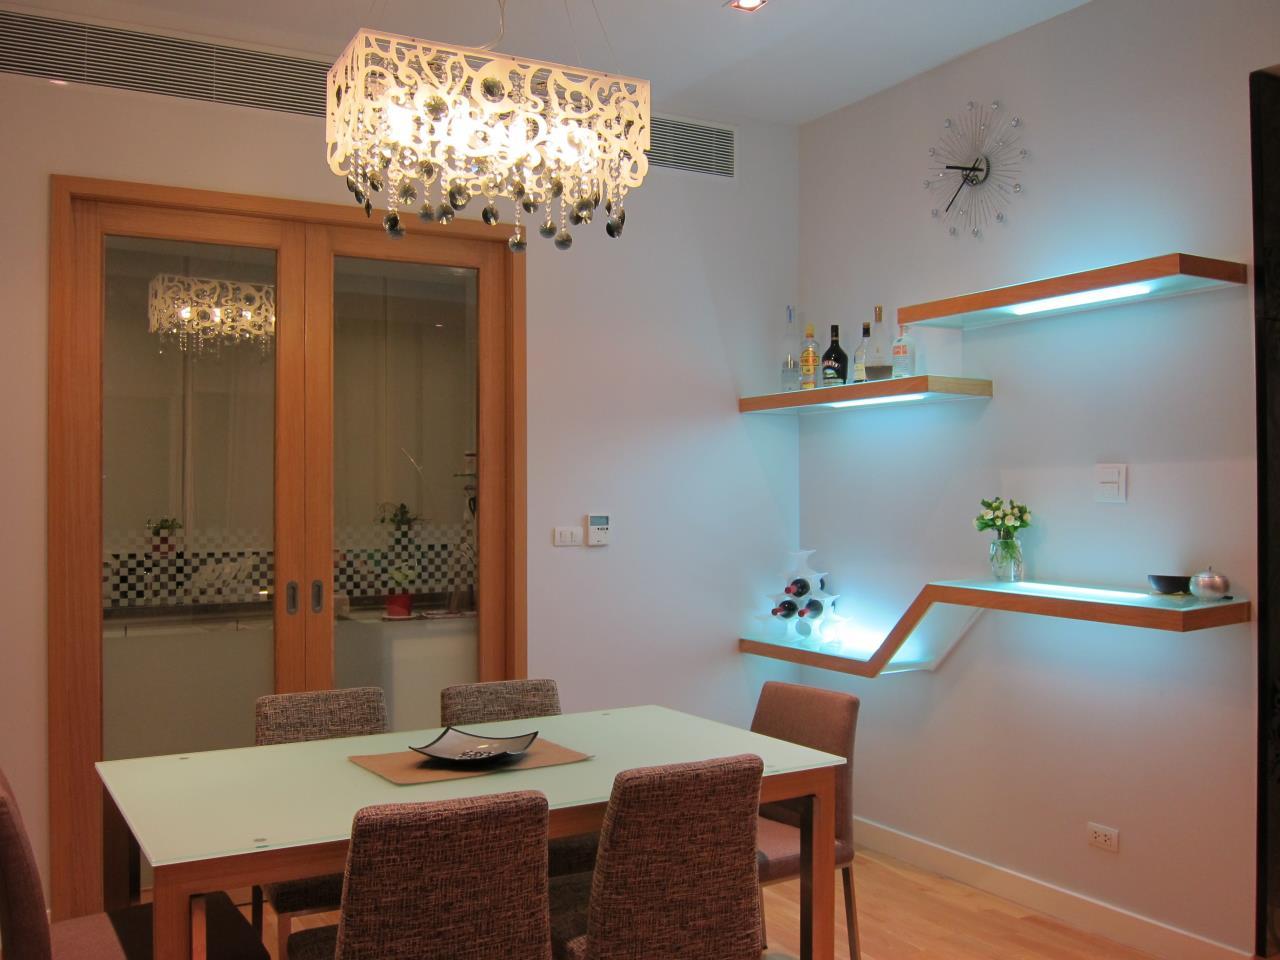 Piri Property Agency's 2 bedrooms Condominium  on tower B floor For Rent 2 7